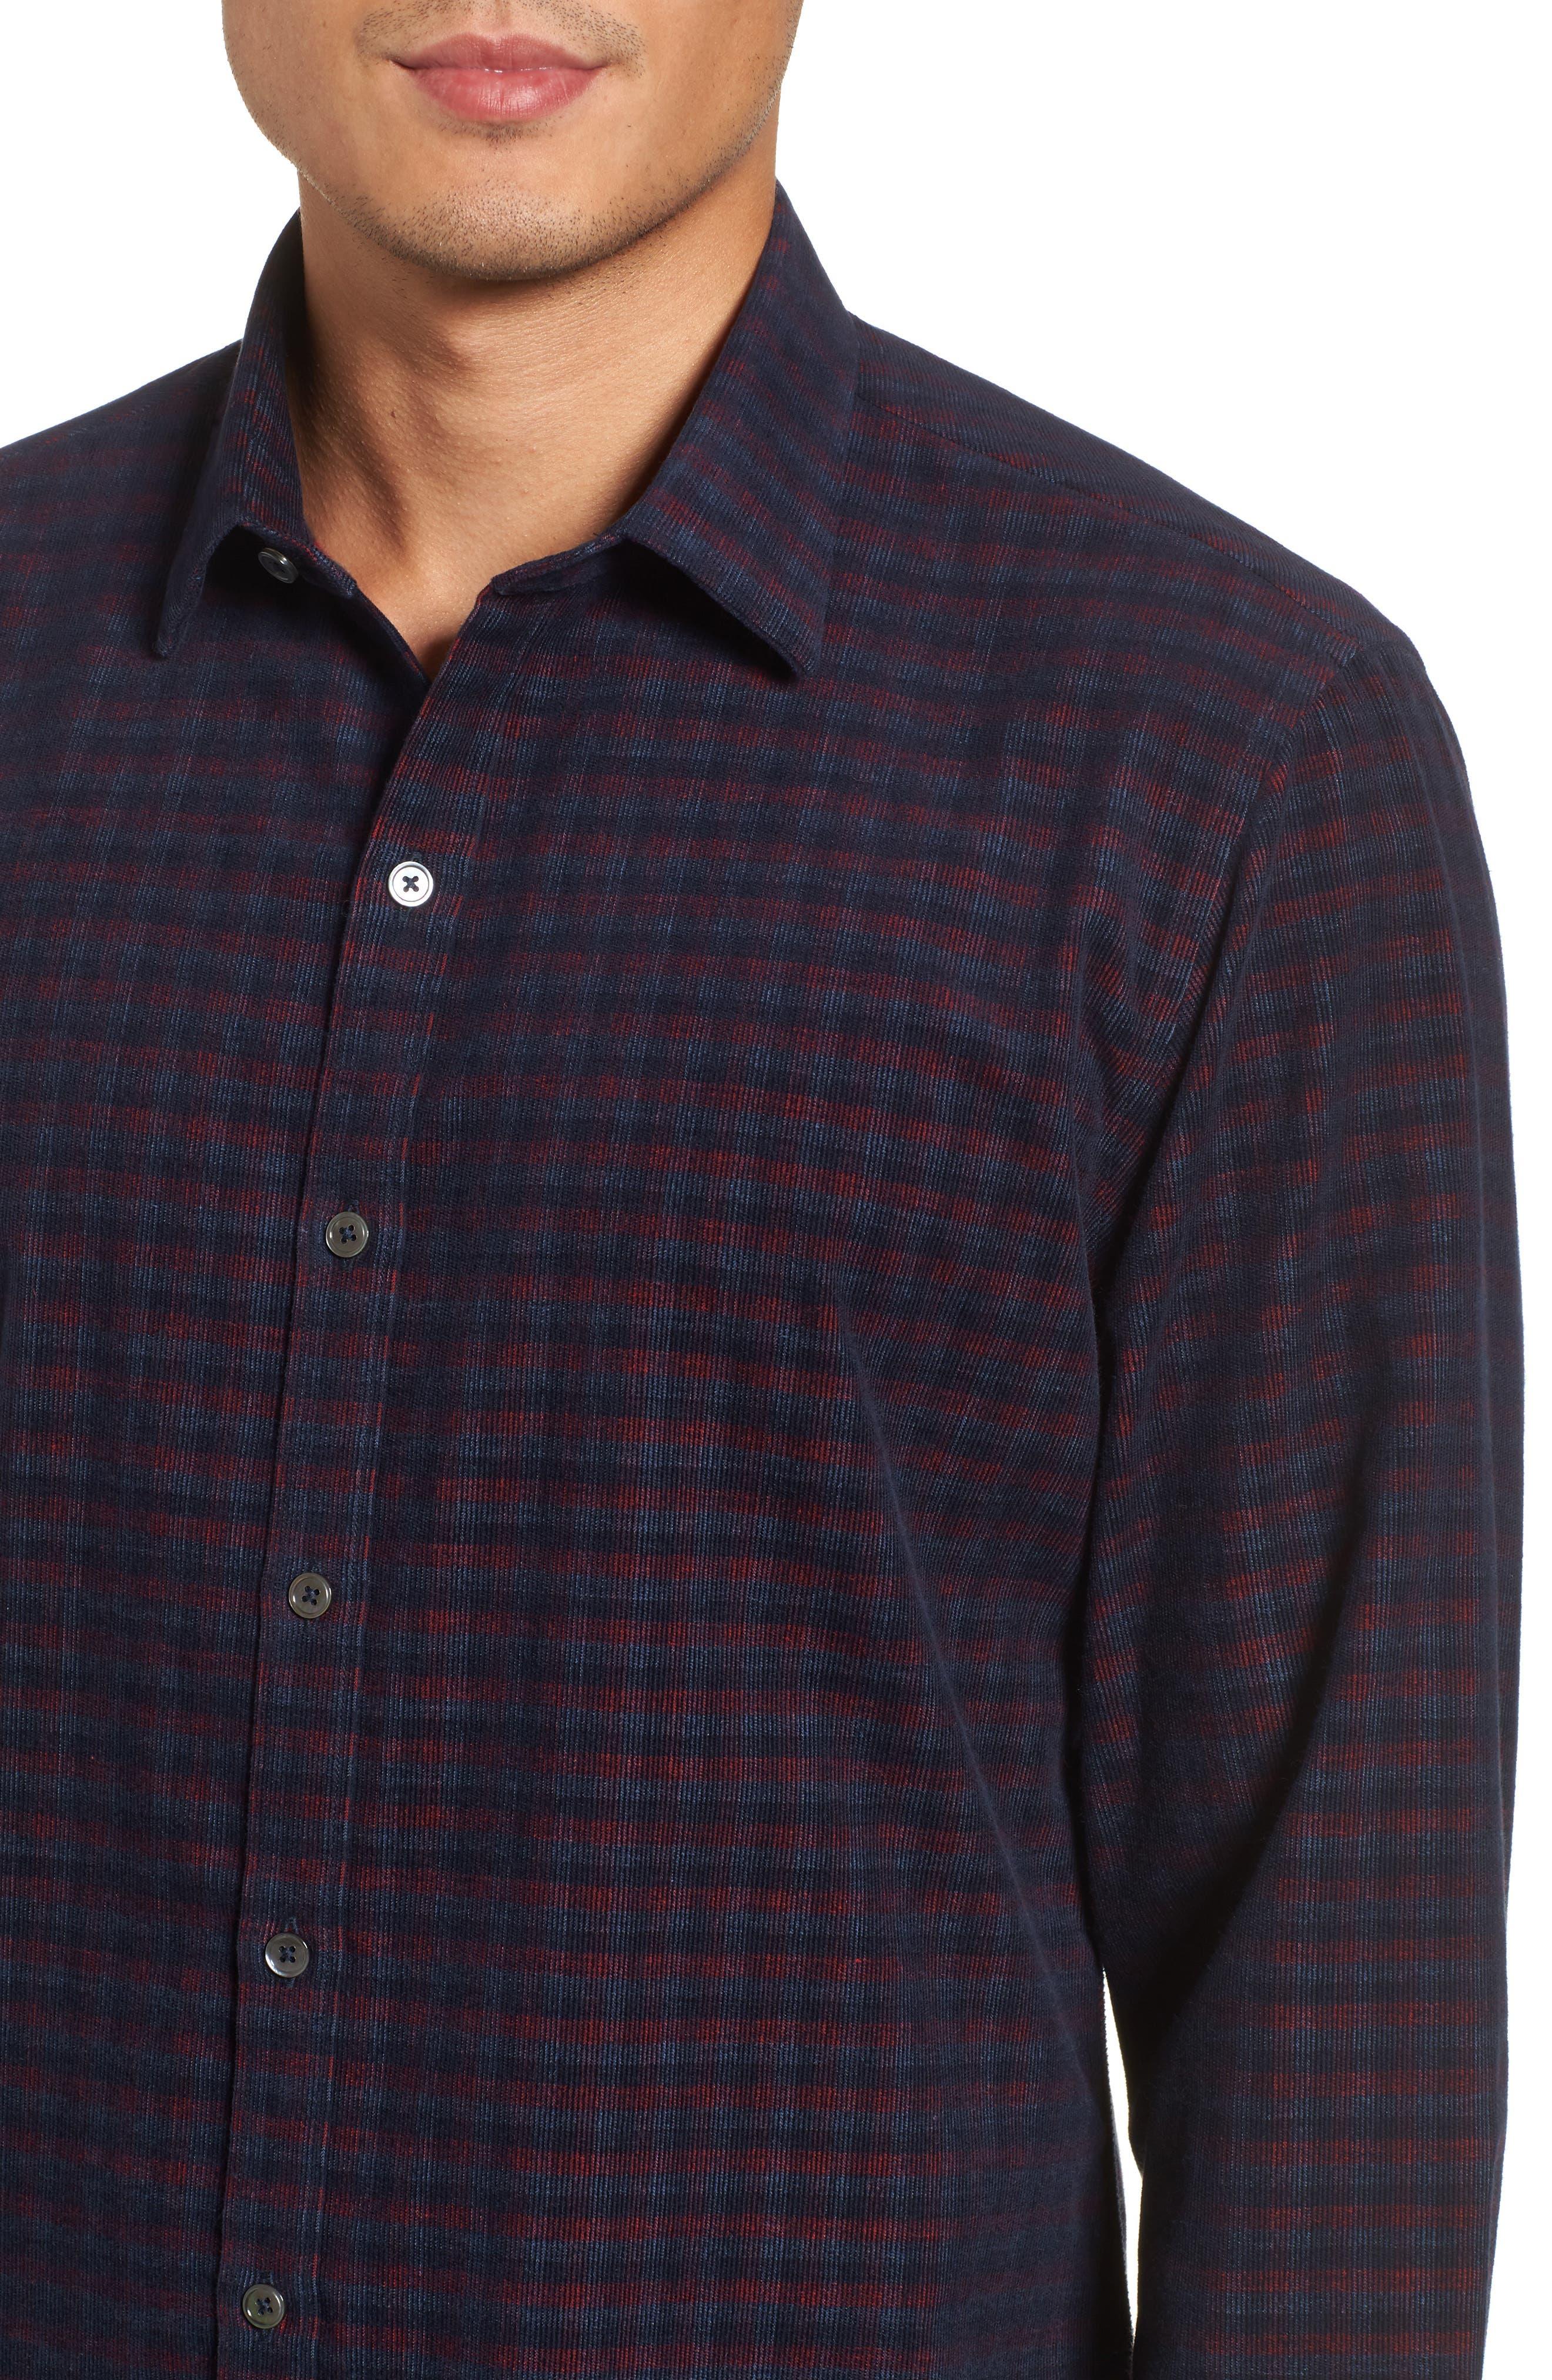 Byas Check Corduroy Sport Shirt,                             Alternate thumbnail 4, color,                             410